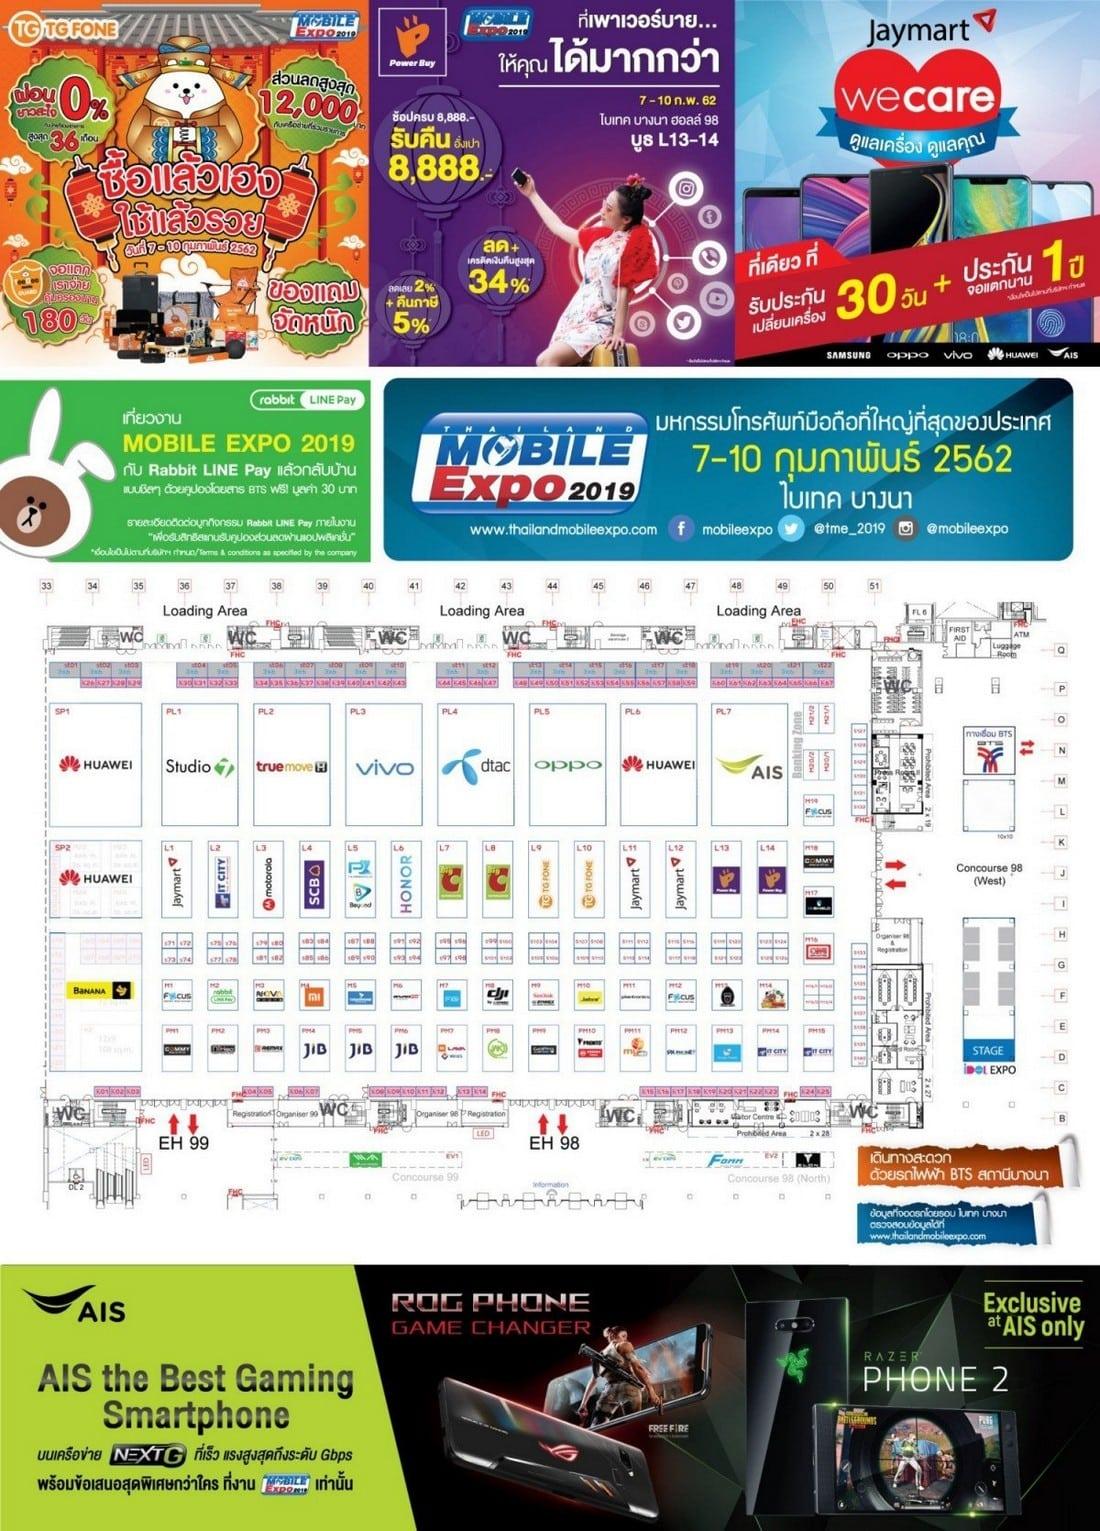 TME 2019 1 Brochure 04 - โบรชัวร์งาน Thailand Mobile Expo 2019 ที่จะจัดขึ้นวันที่ 7-10กุมภาพันธ์นี้ ที่ไบเทค บางนา